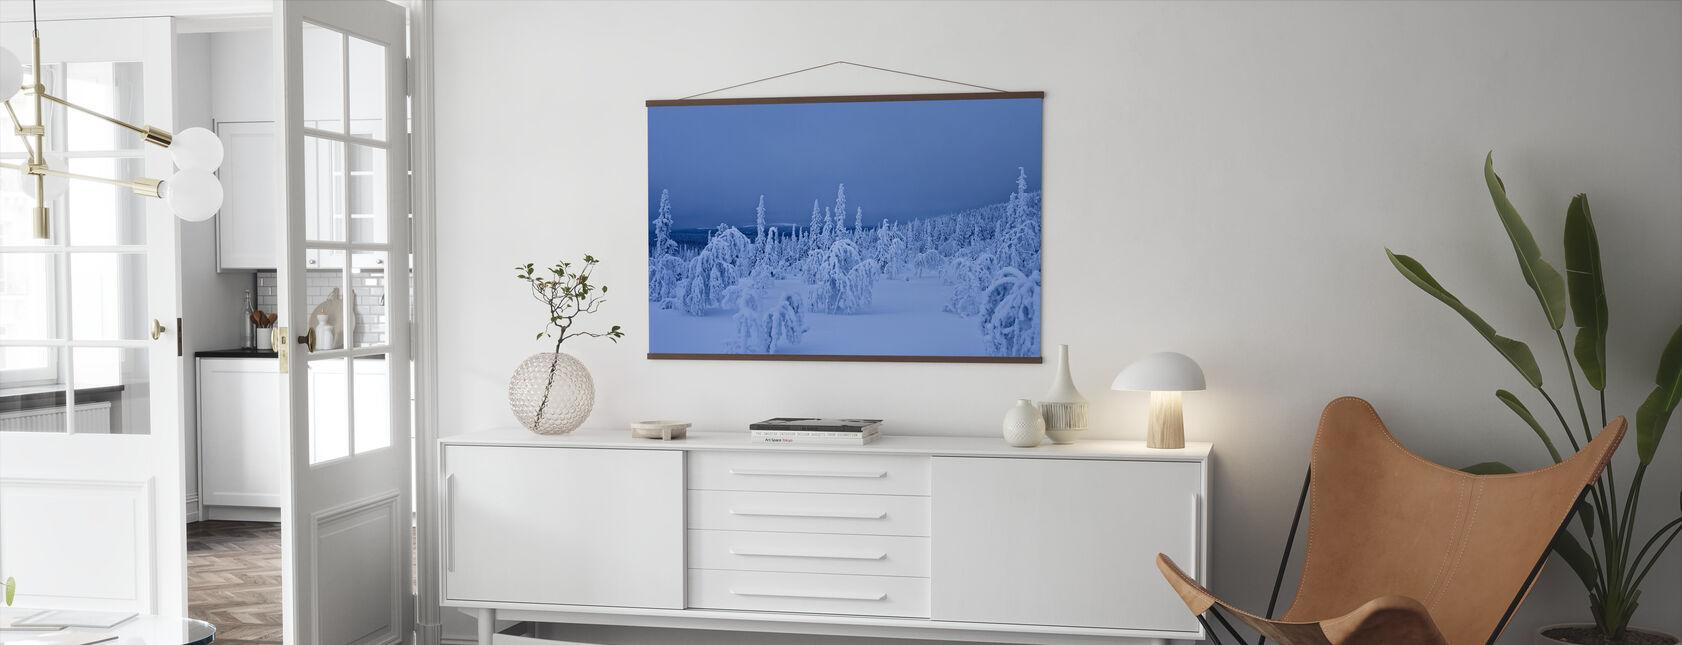 Blue Winter in Lapland, Sweden - Poster - Living Room